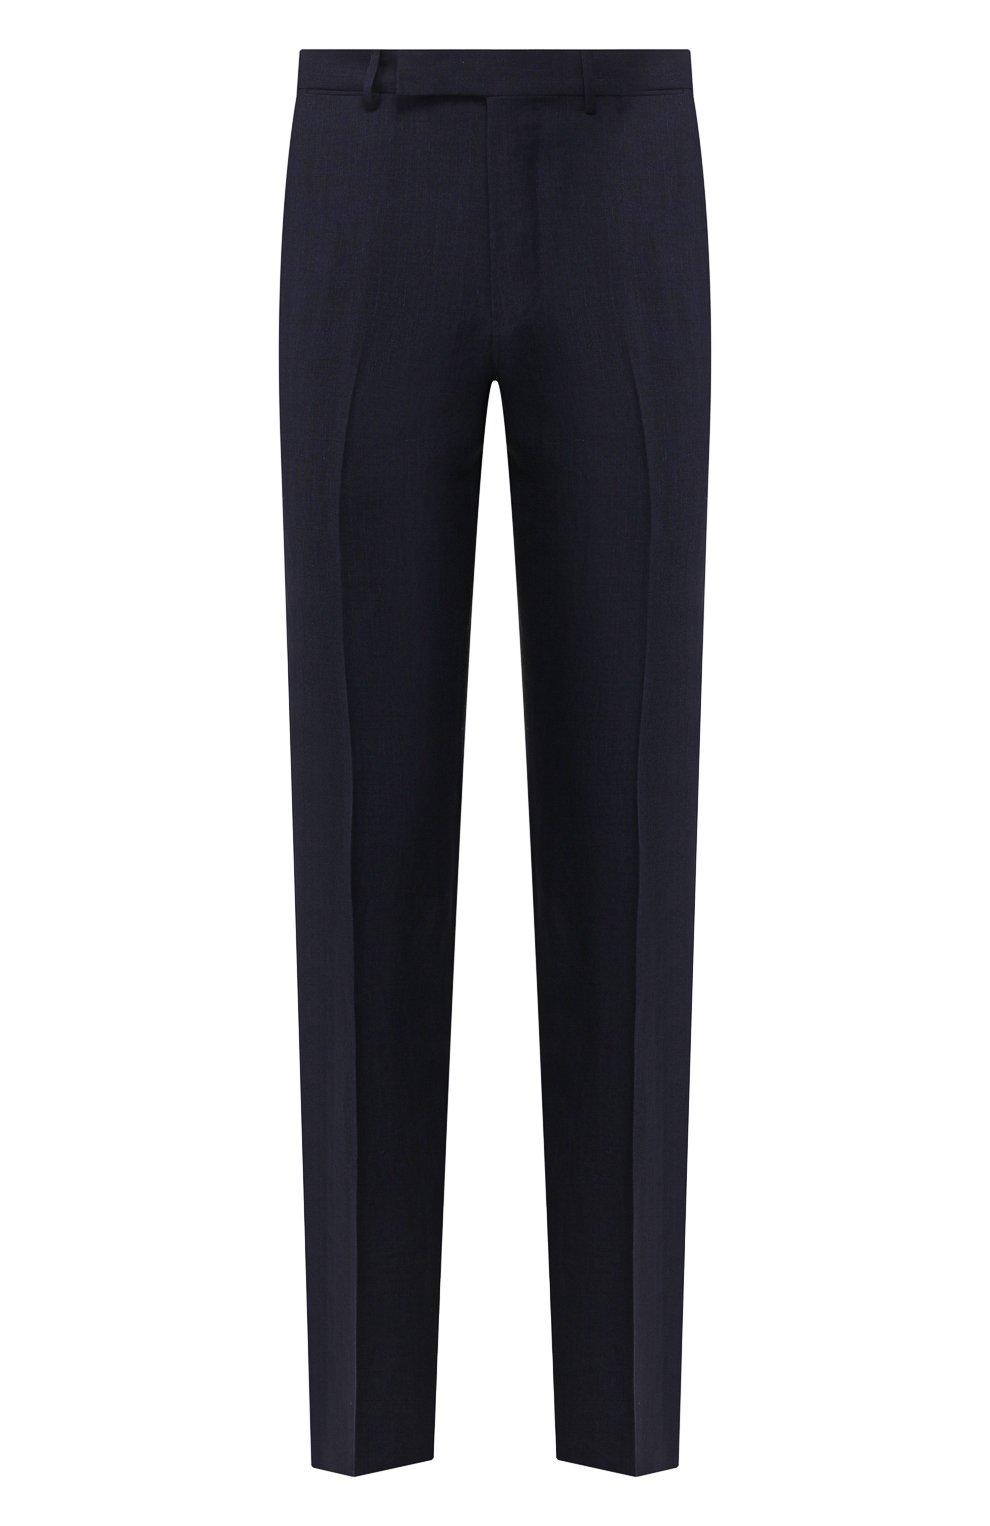 Мужские брюки из смеси льна и шерсти ERMENEGILDO ZEGNA темно-синего цвета, арт. 770F04/75TB12   Фото 1